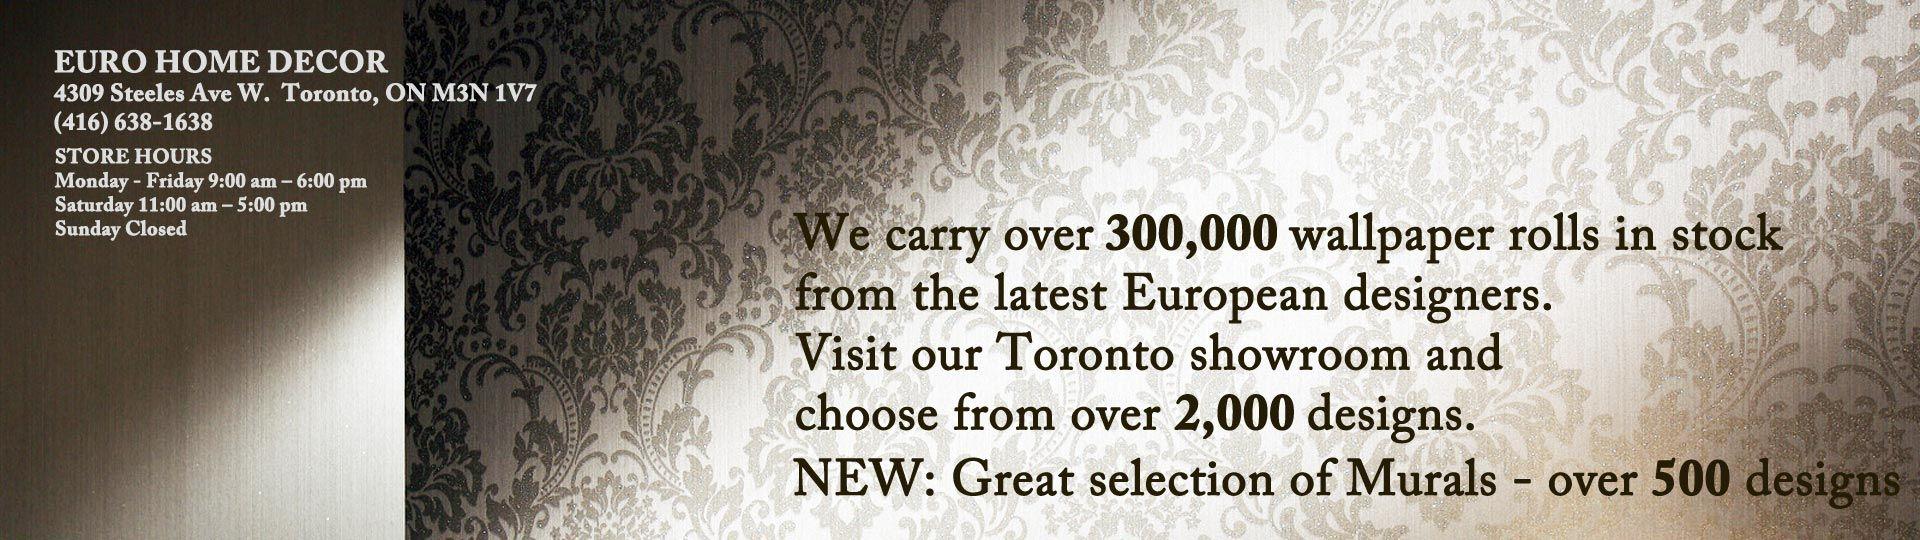 Euro Home Decor 4309 Steeles Ave W Toronto Ontario M3n 1v Over - home decor toronto ontario